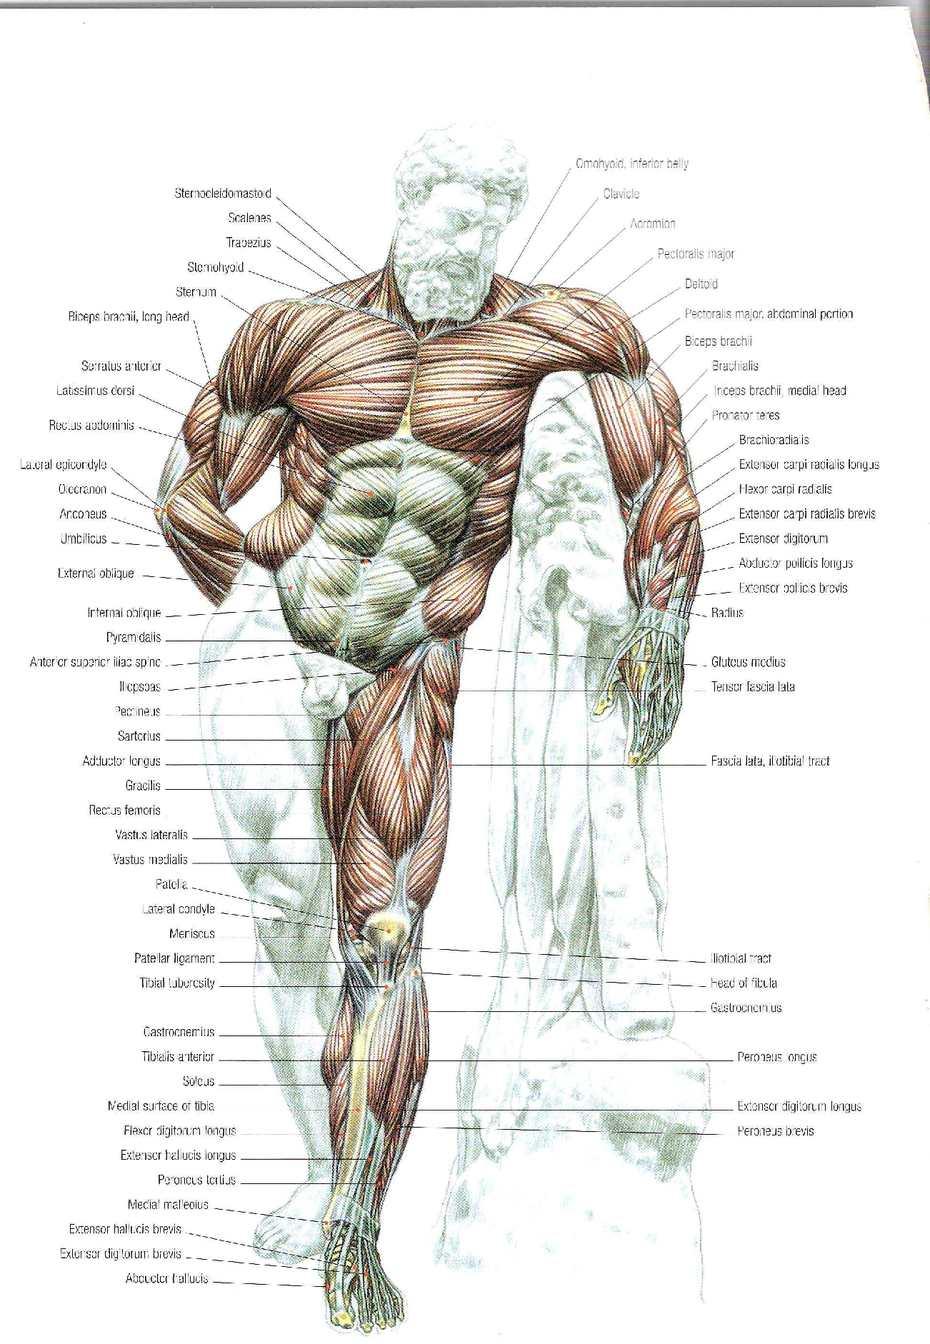 Strength Training Anatomy 2nd Edition Calameo Downloader